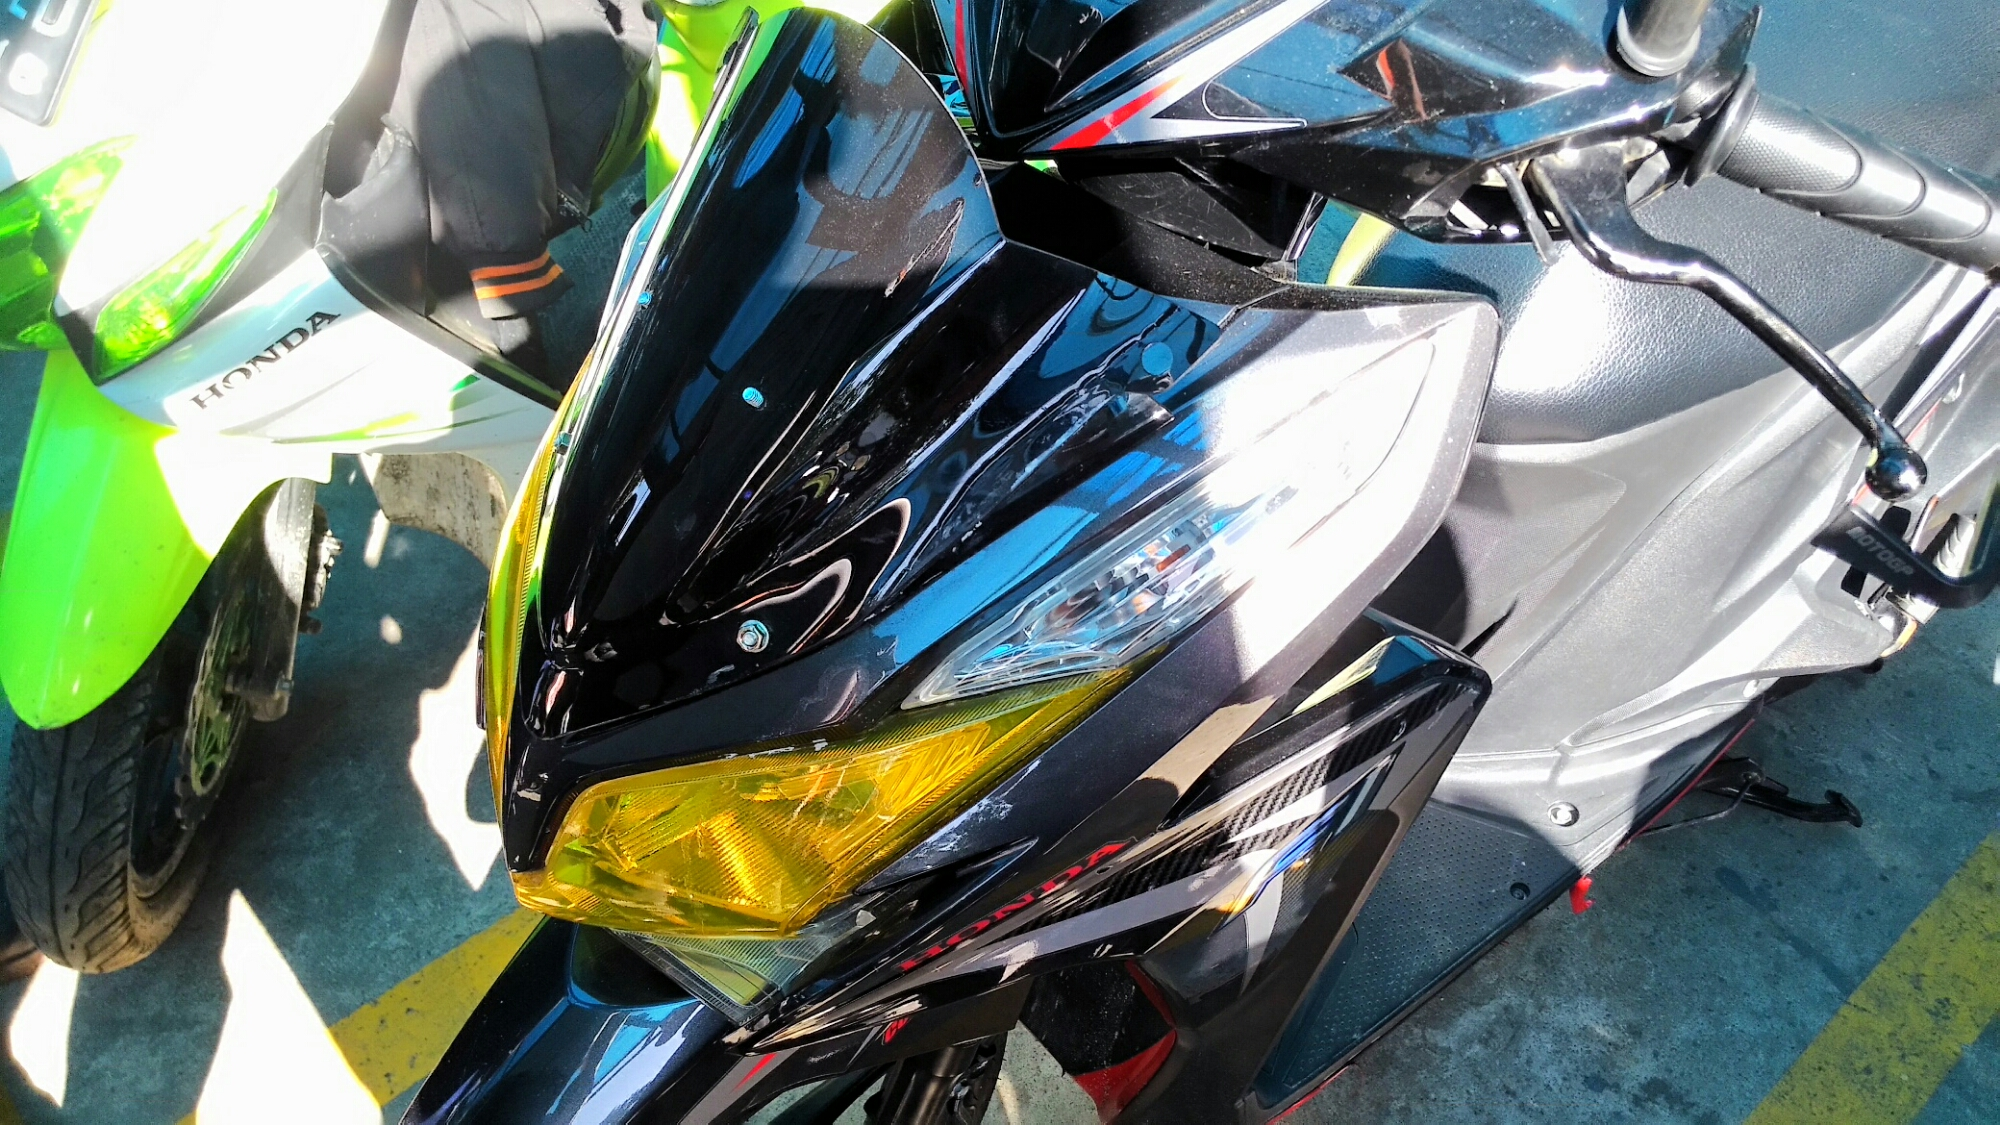 Modifikasi Penambahan Visor Pada Honda Vario 125 Keren Dan Budget